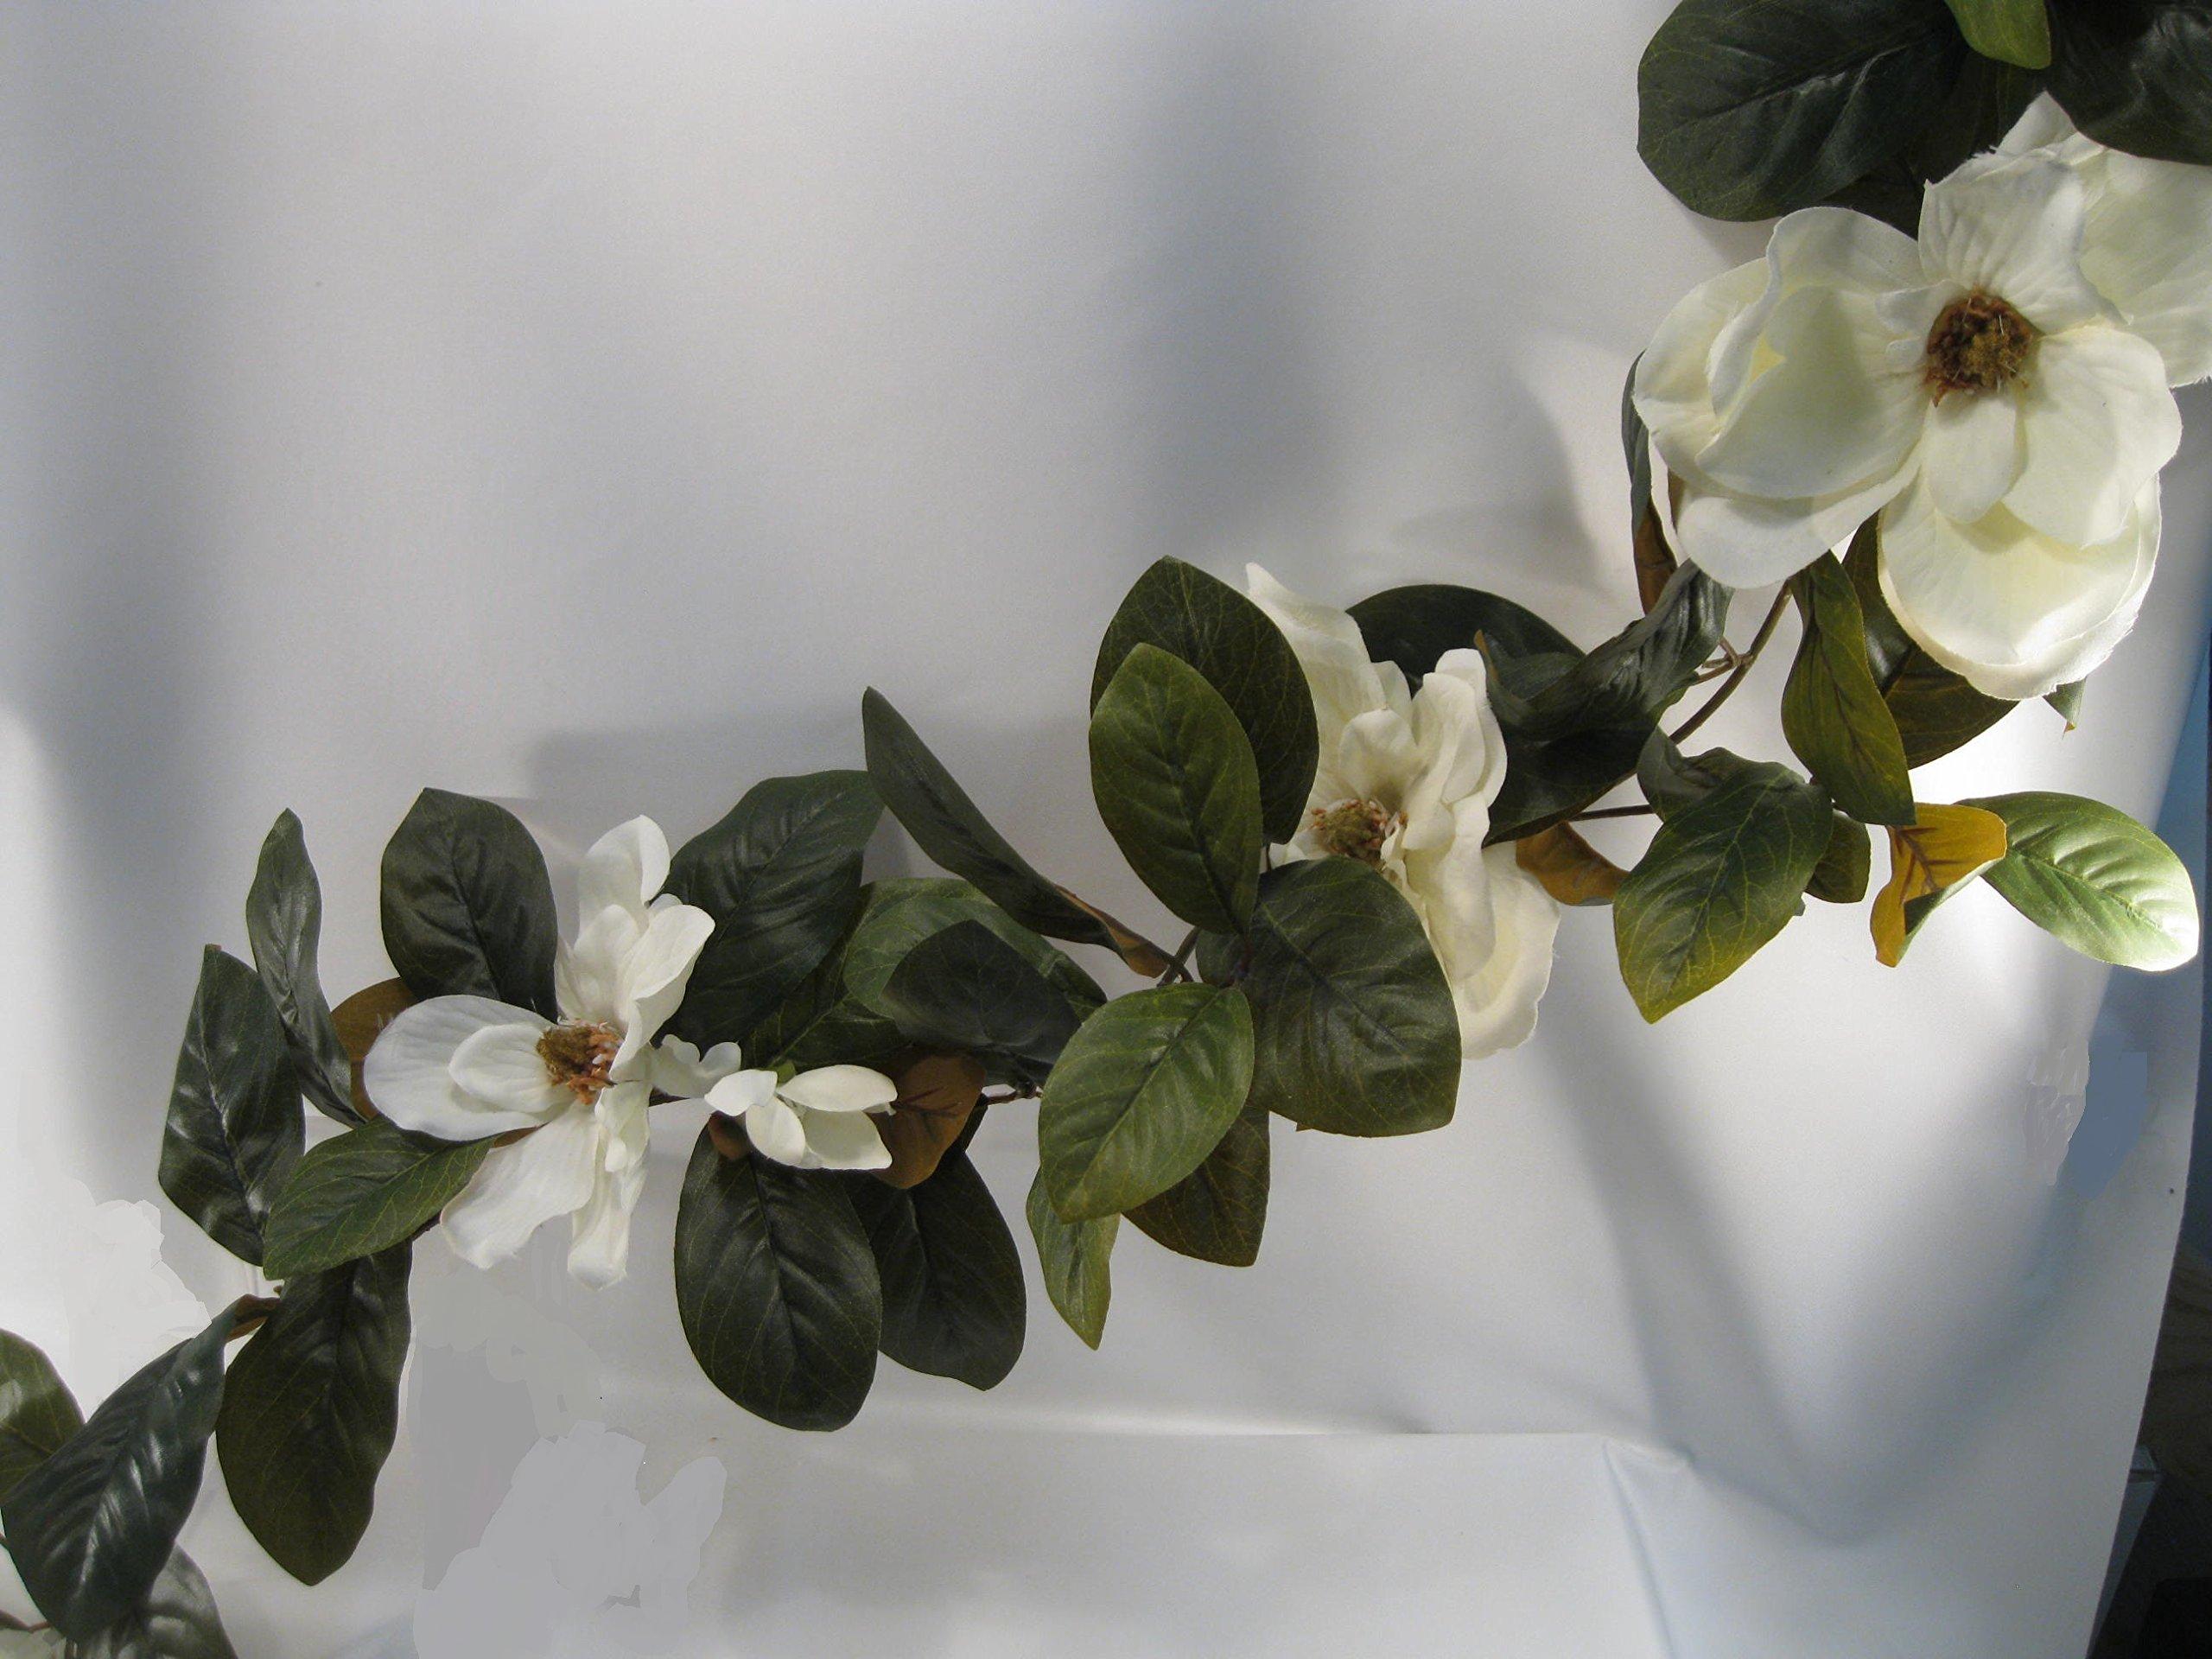 Magnolia Blossom and Leaf Garland (6 FT)